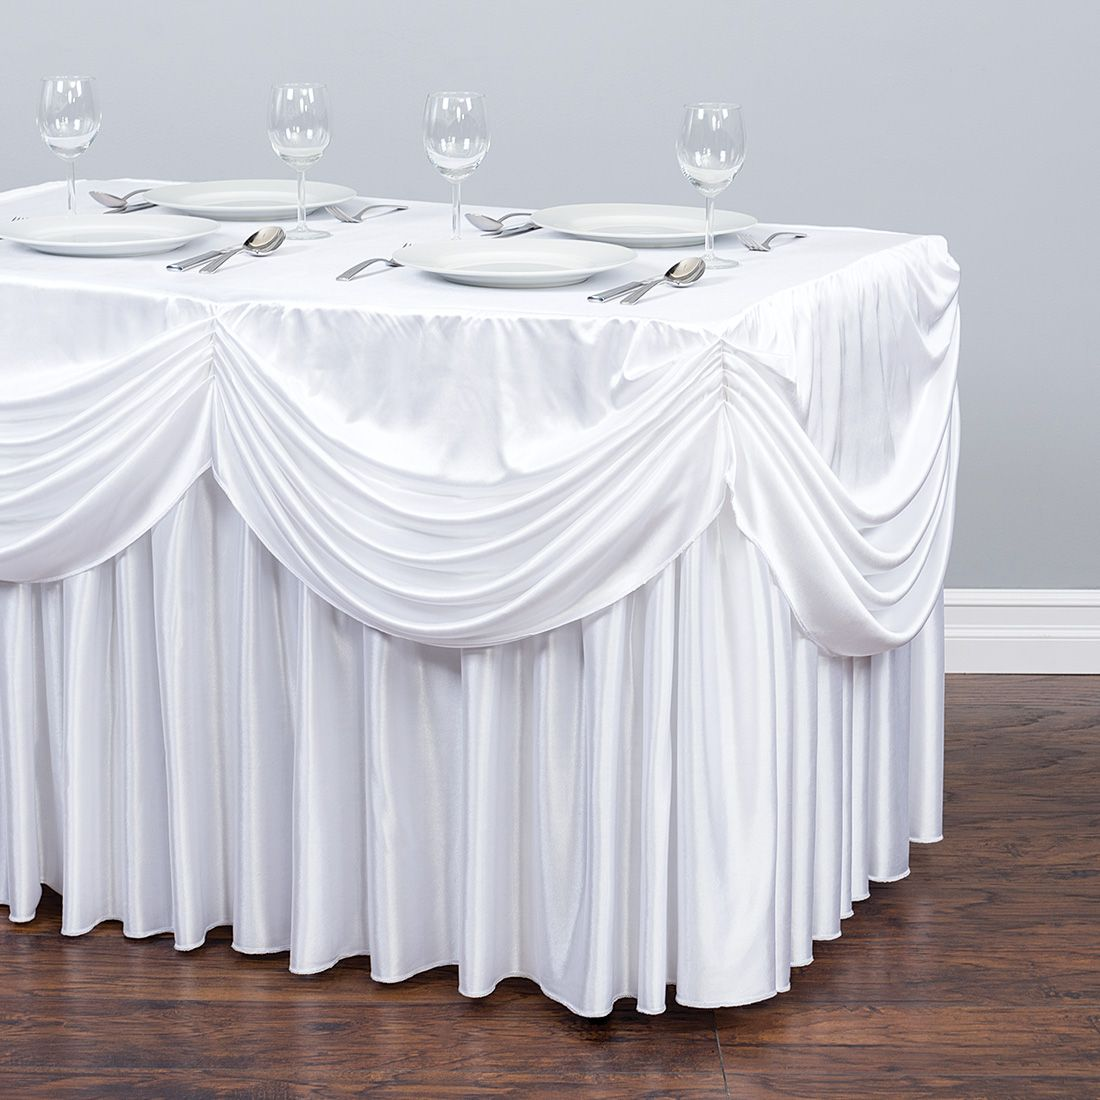 4 ft. Drape Chiffon Allin1 Tablecloth/Pleated Skirt